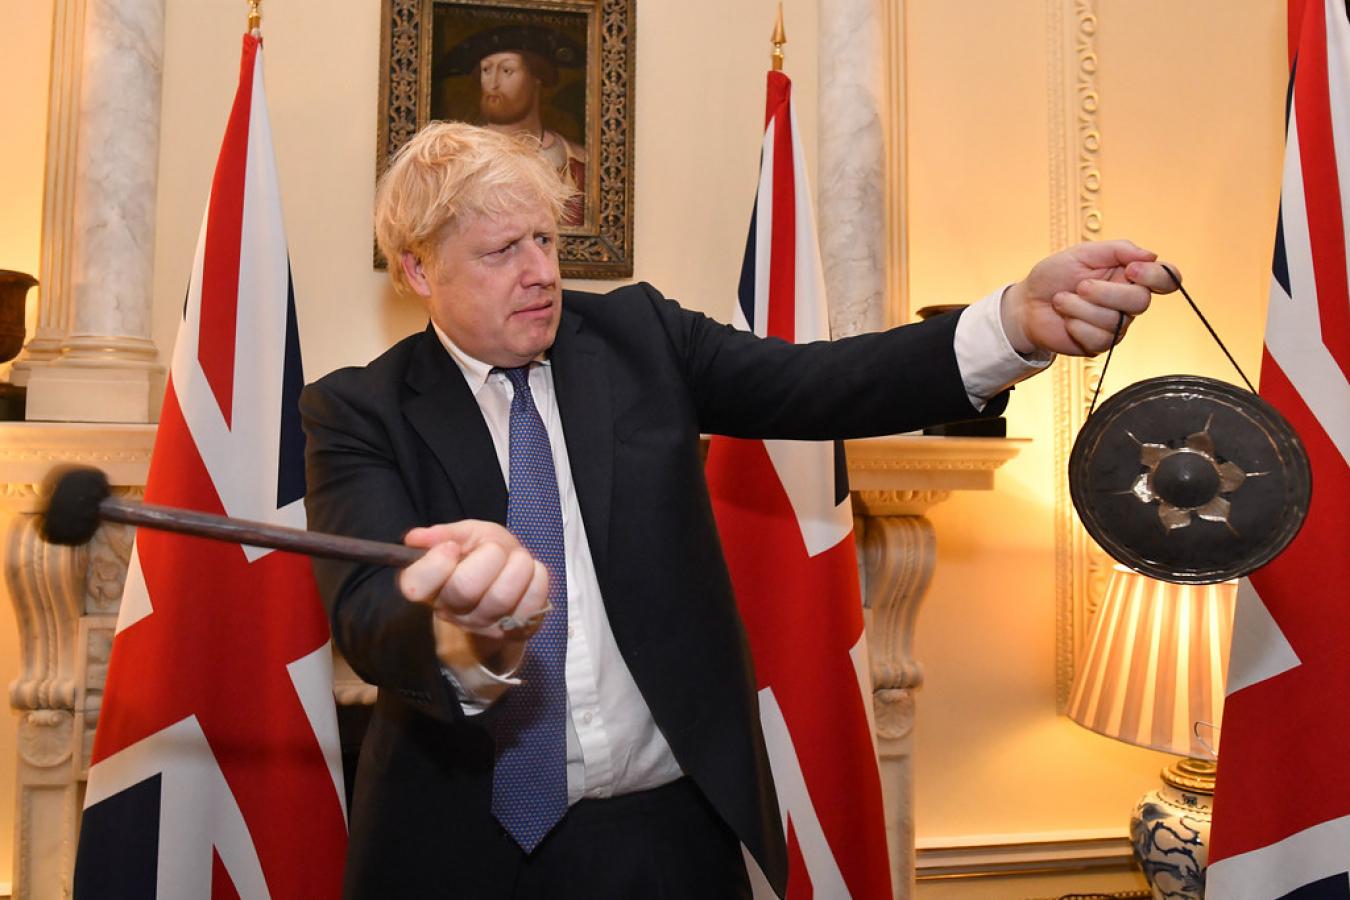 Boris Johnson Brexit Day 31 January 2020